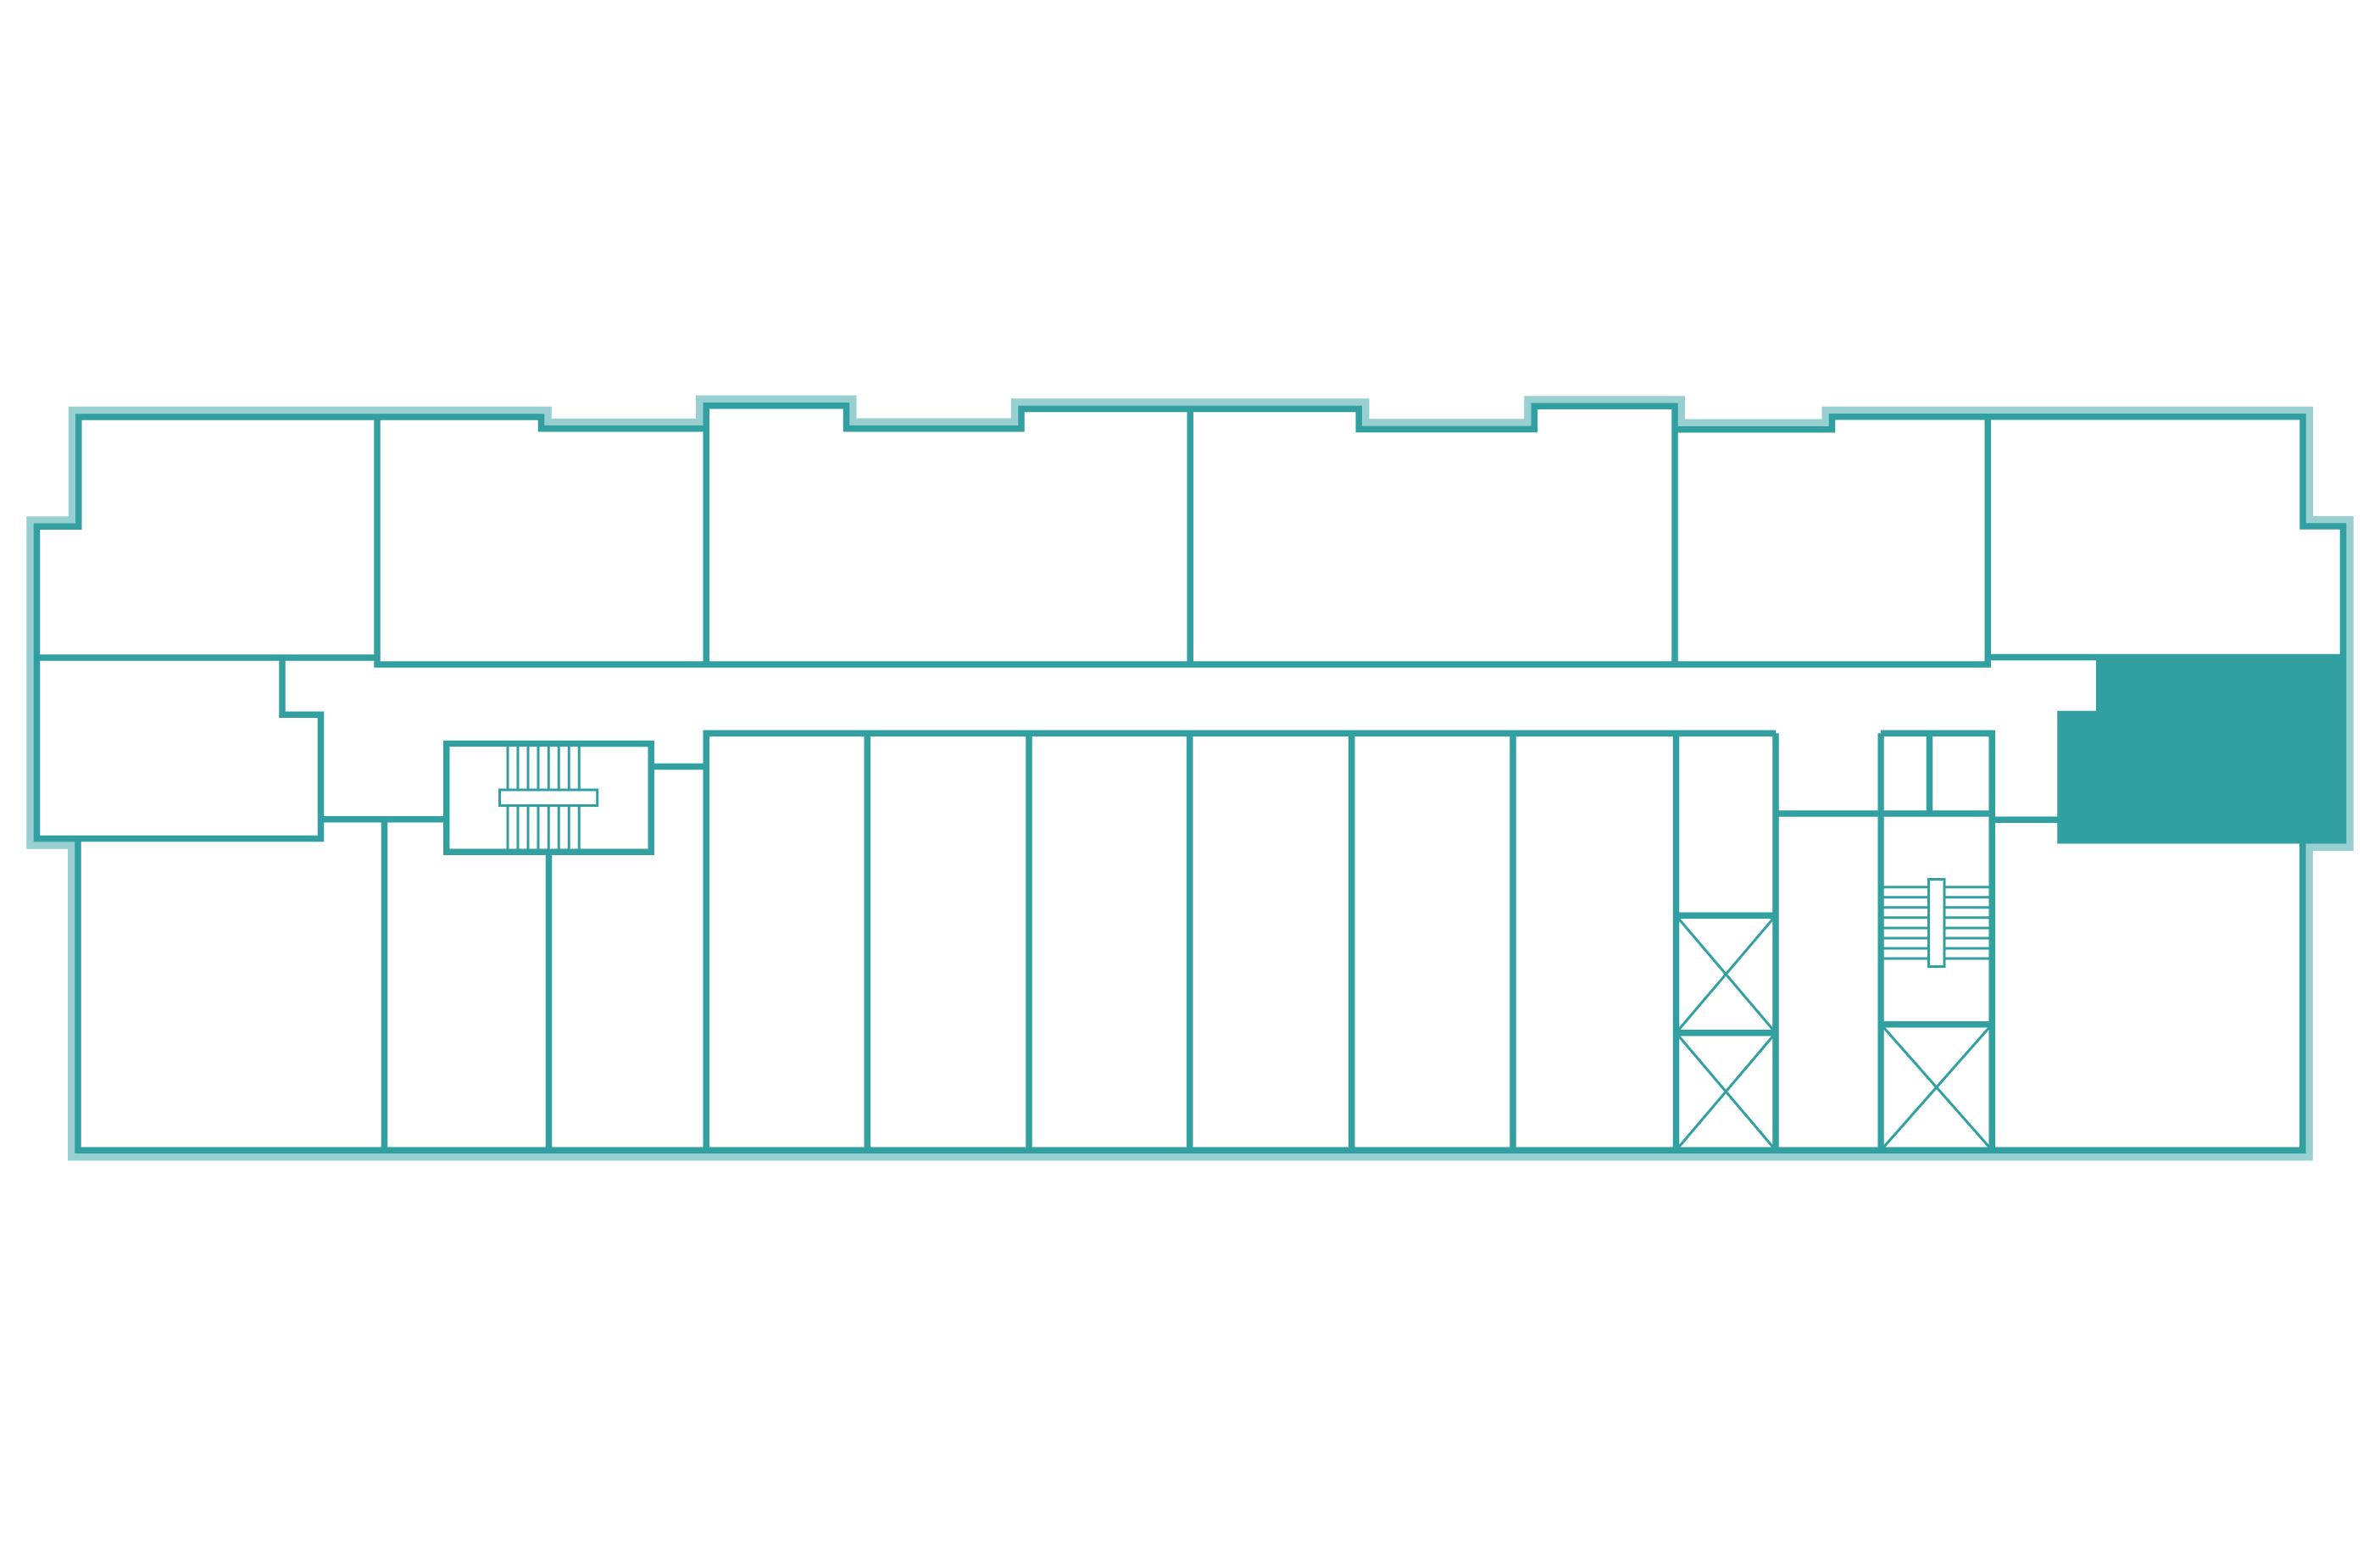 floorplan image of unit image 0718